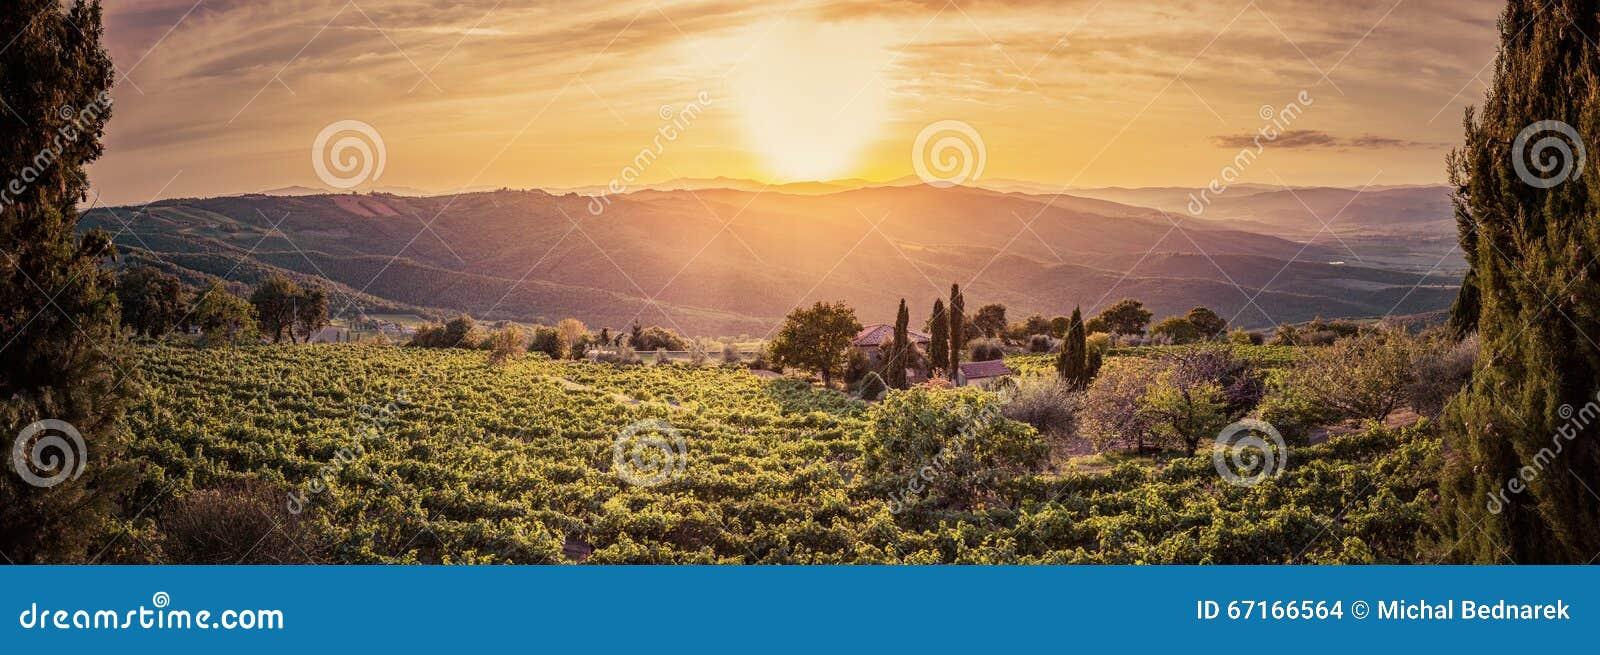 Vineyard landscape panorama in Tuscany, Italy. Wine farm at sunset